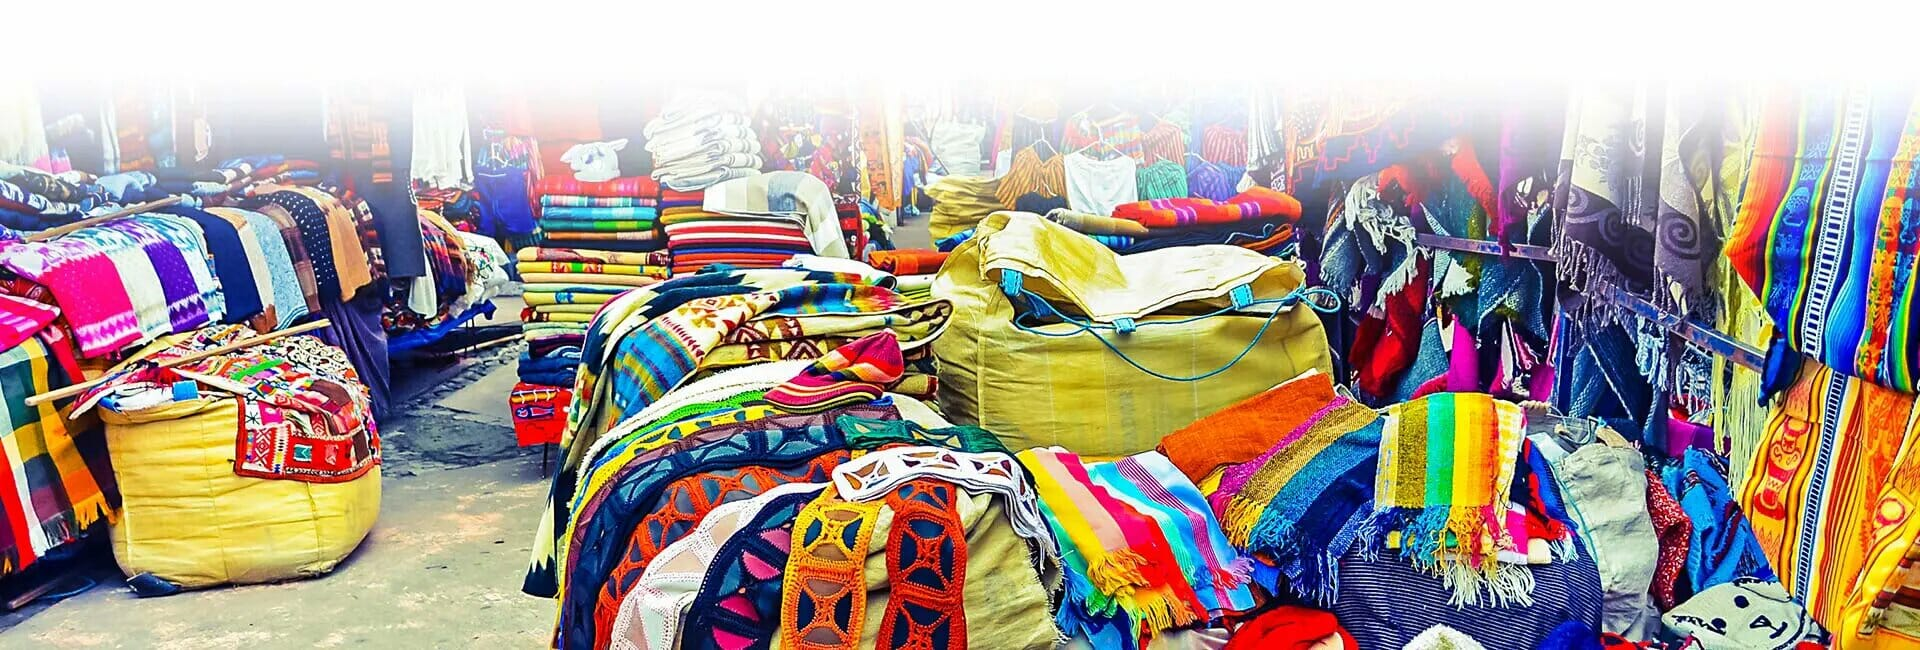 colorful otavalo market stalls ecuador